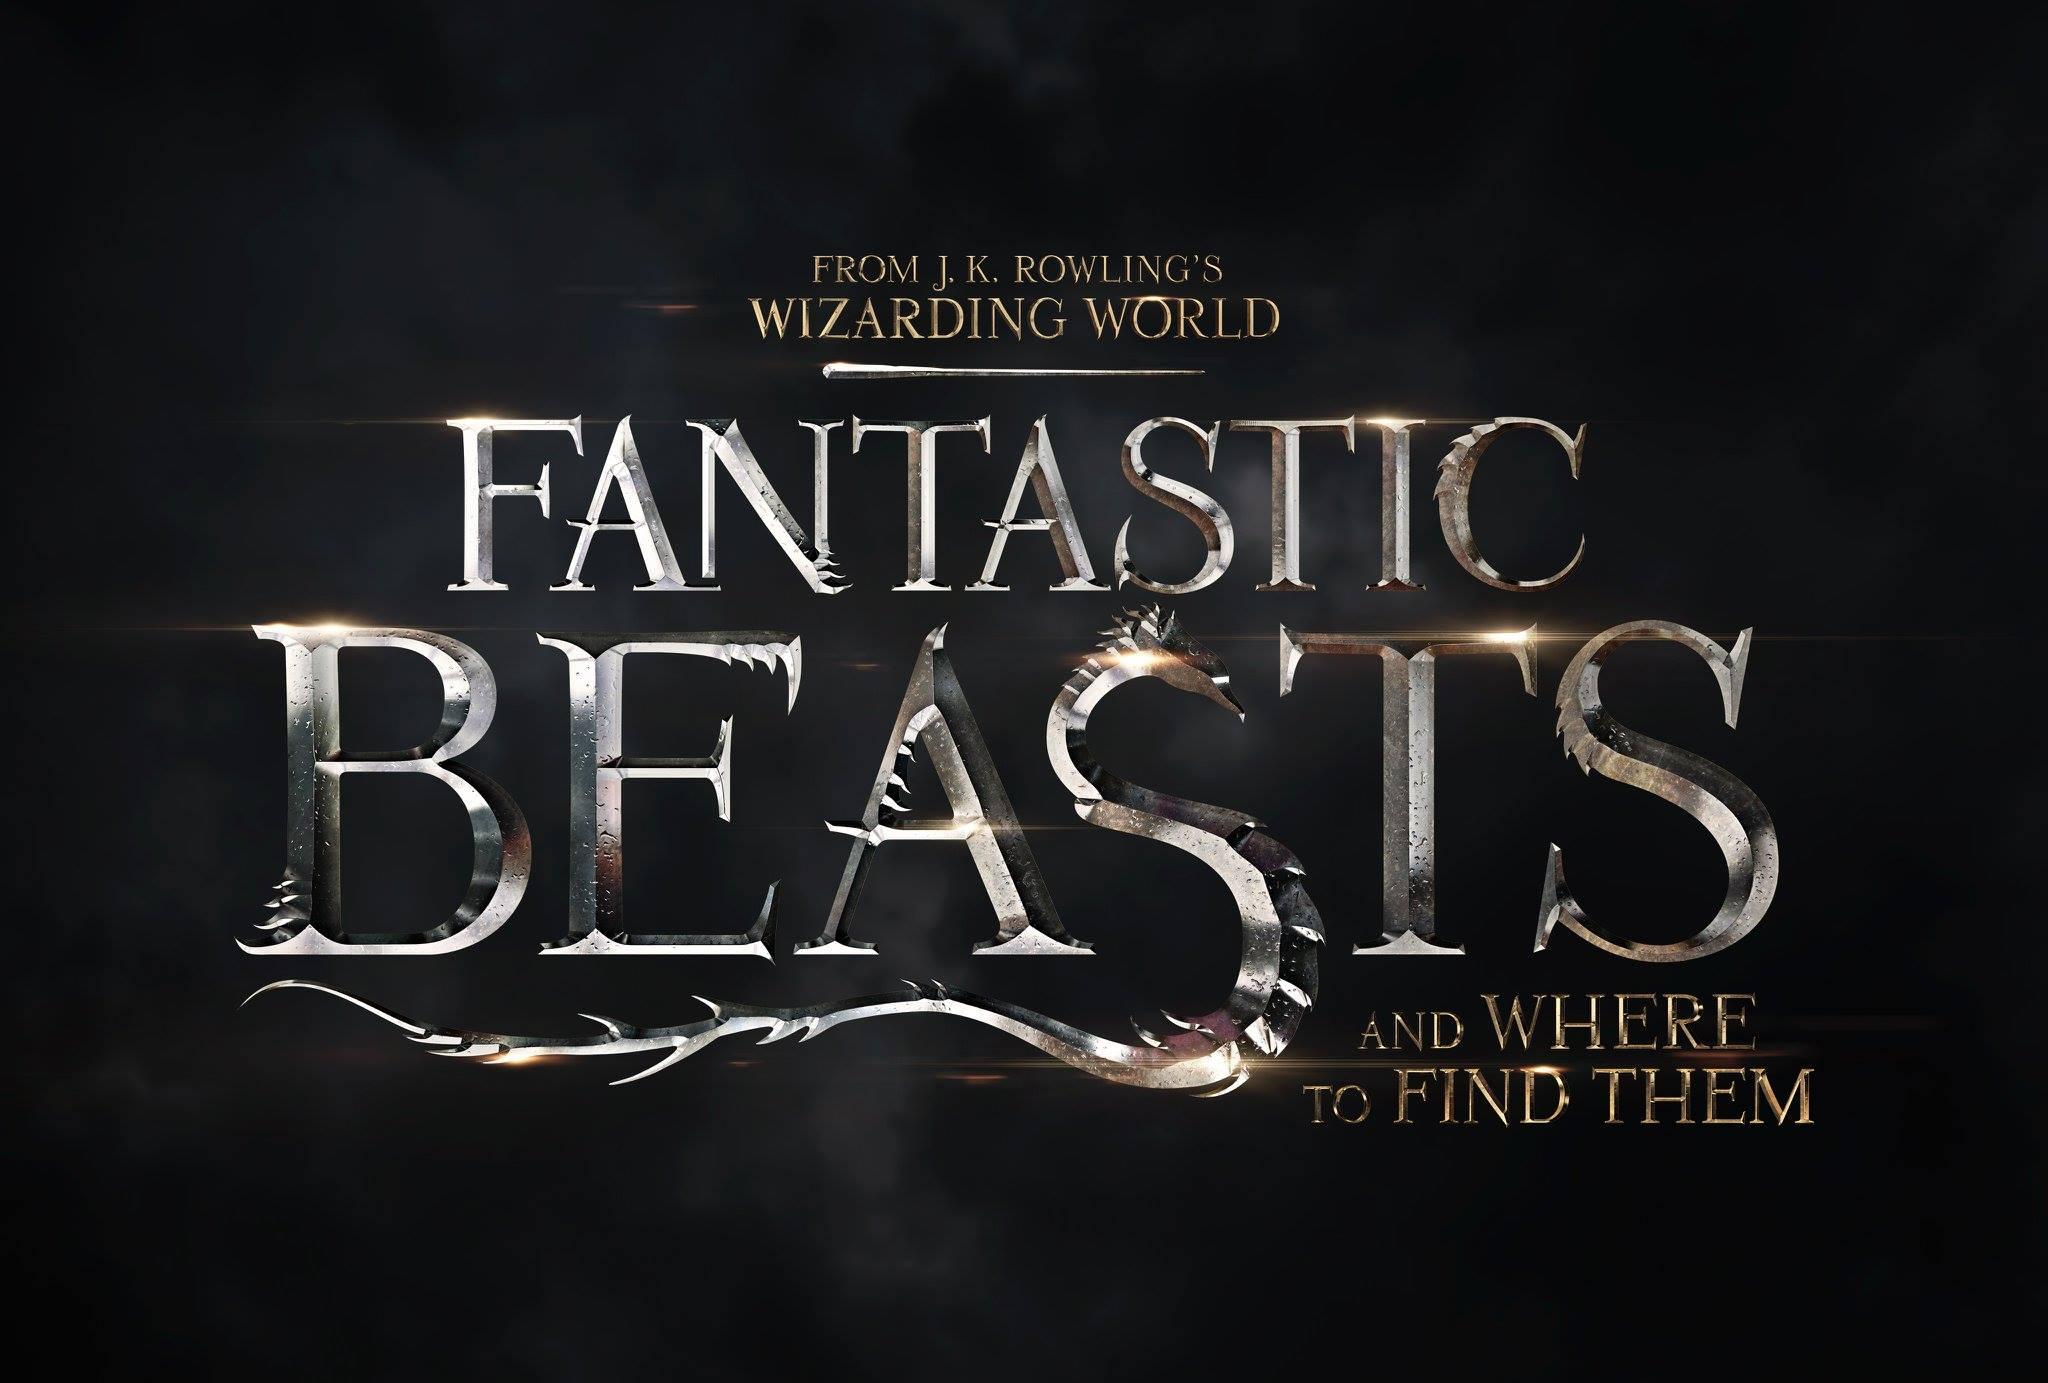 Theatrical Movie Graphic